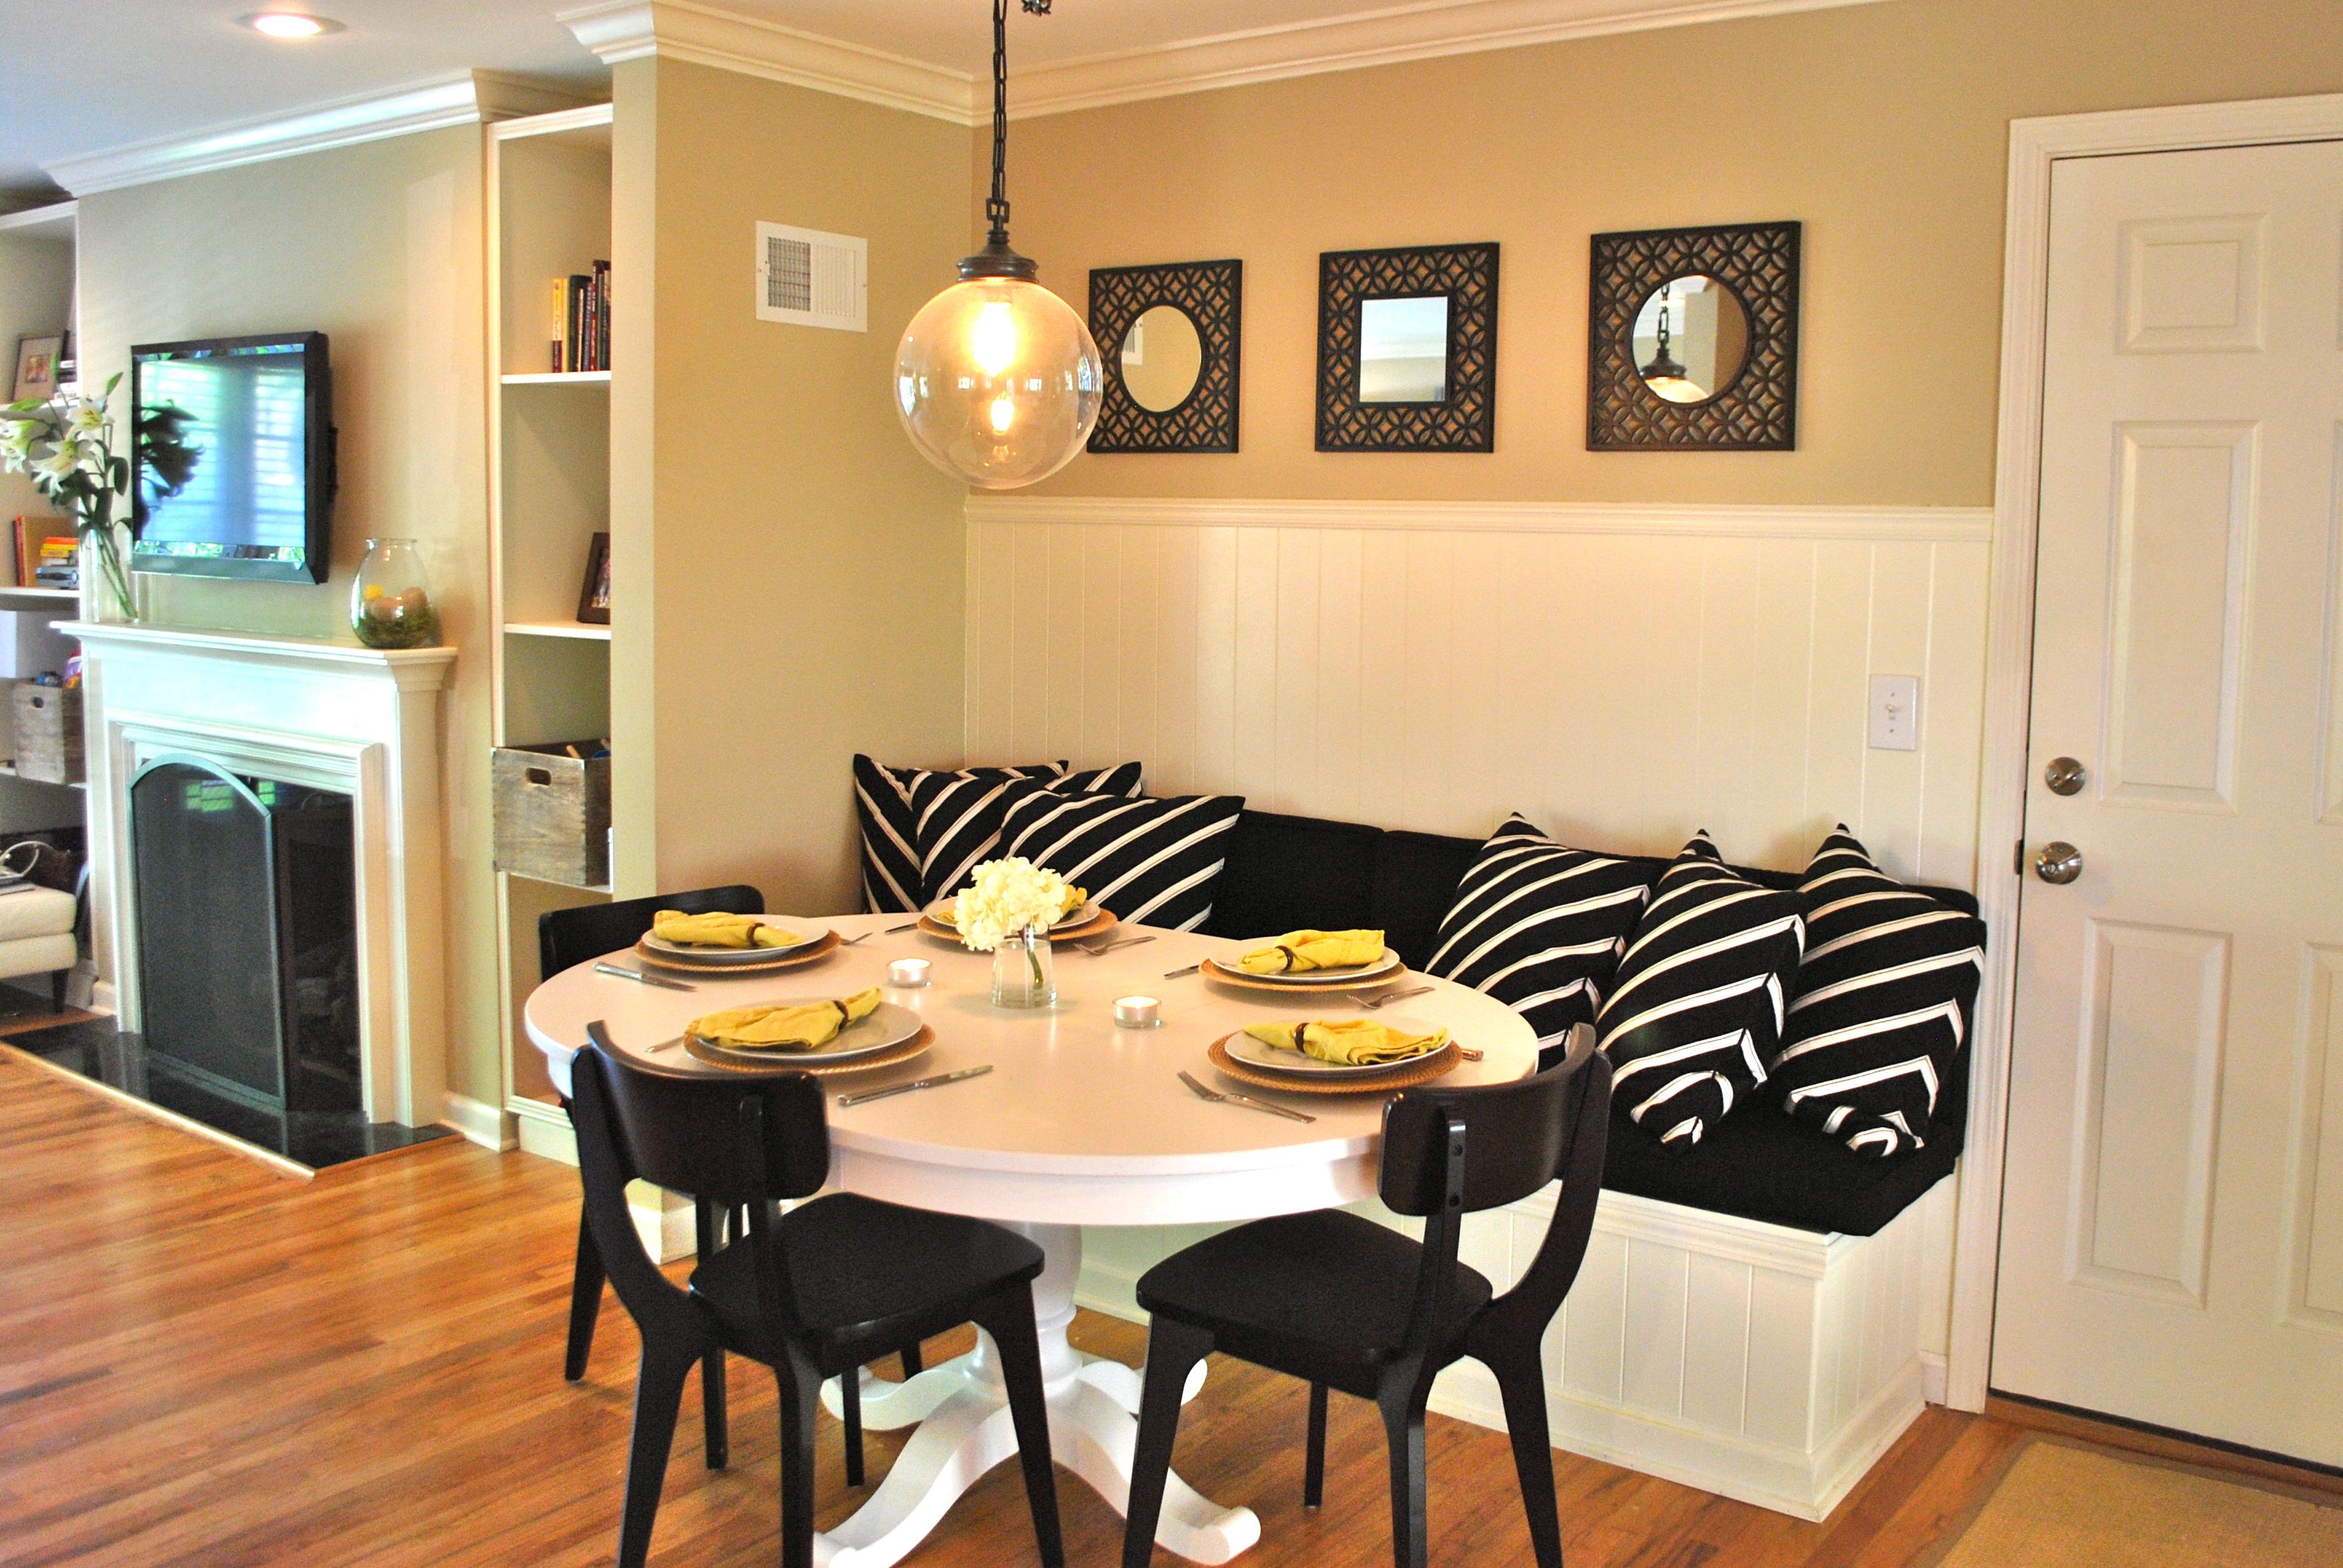 Diy Kitchen Banquette Part 2 Love Your Home